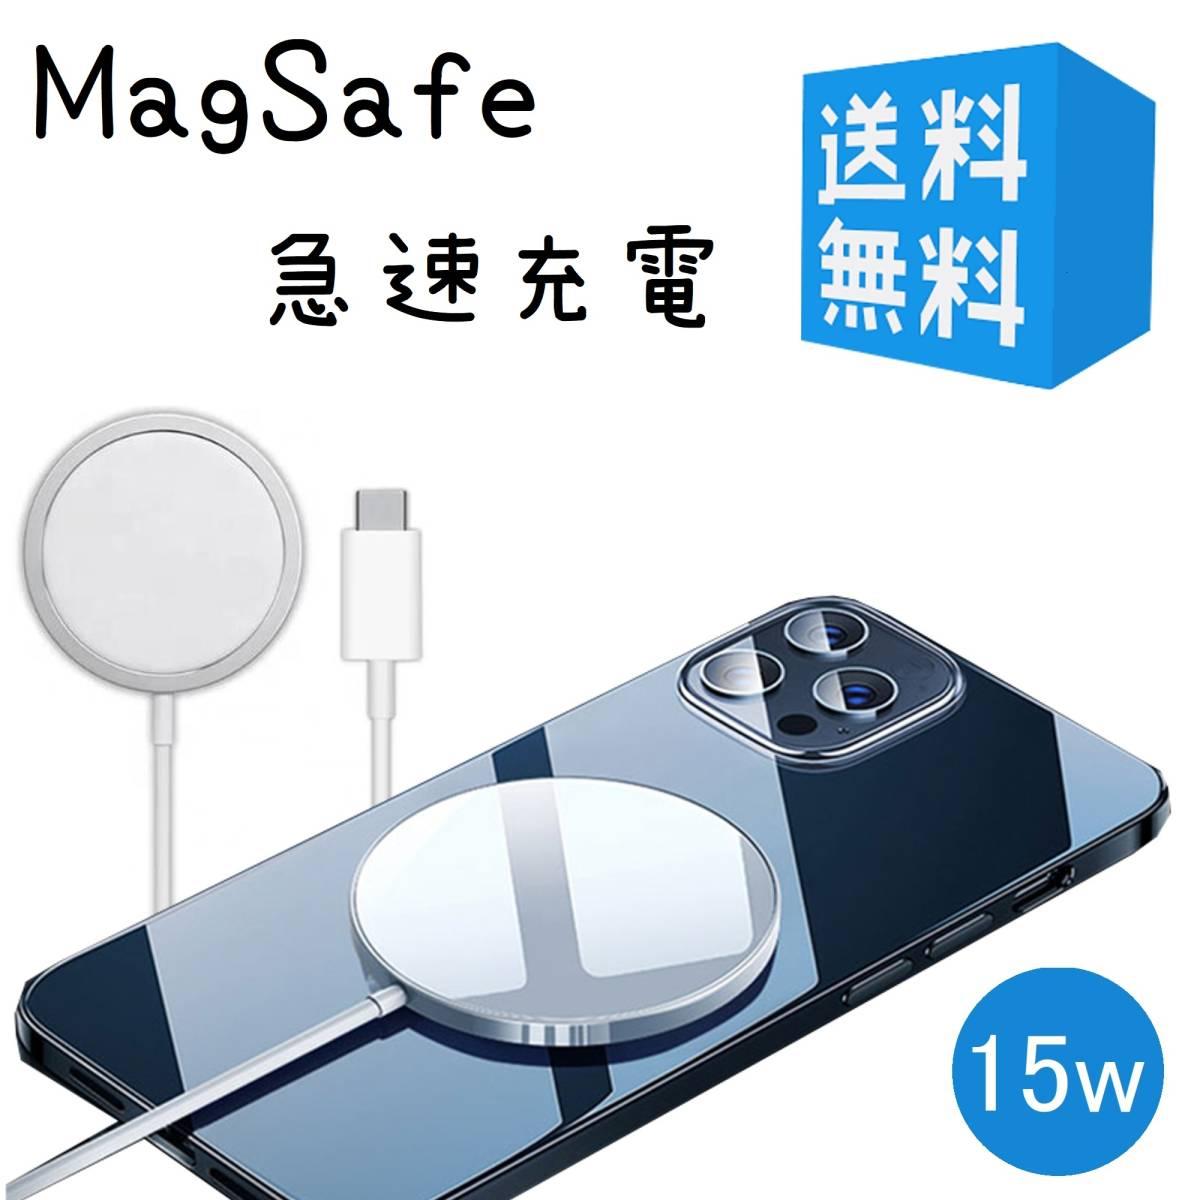 MagSafe充電器 ワイヤレス充電器 iPhone12 マグネット式 ピタッと充電 磁石Qi急速充電器 12 Pro Max iPhone 12 12 Pro 12 Mini